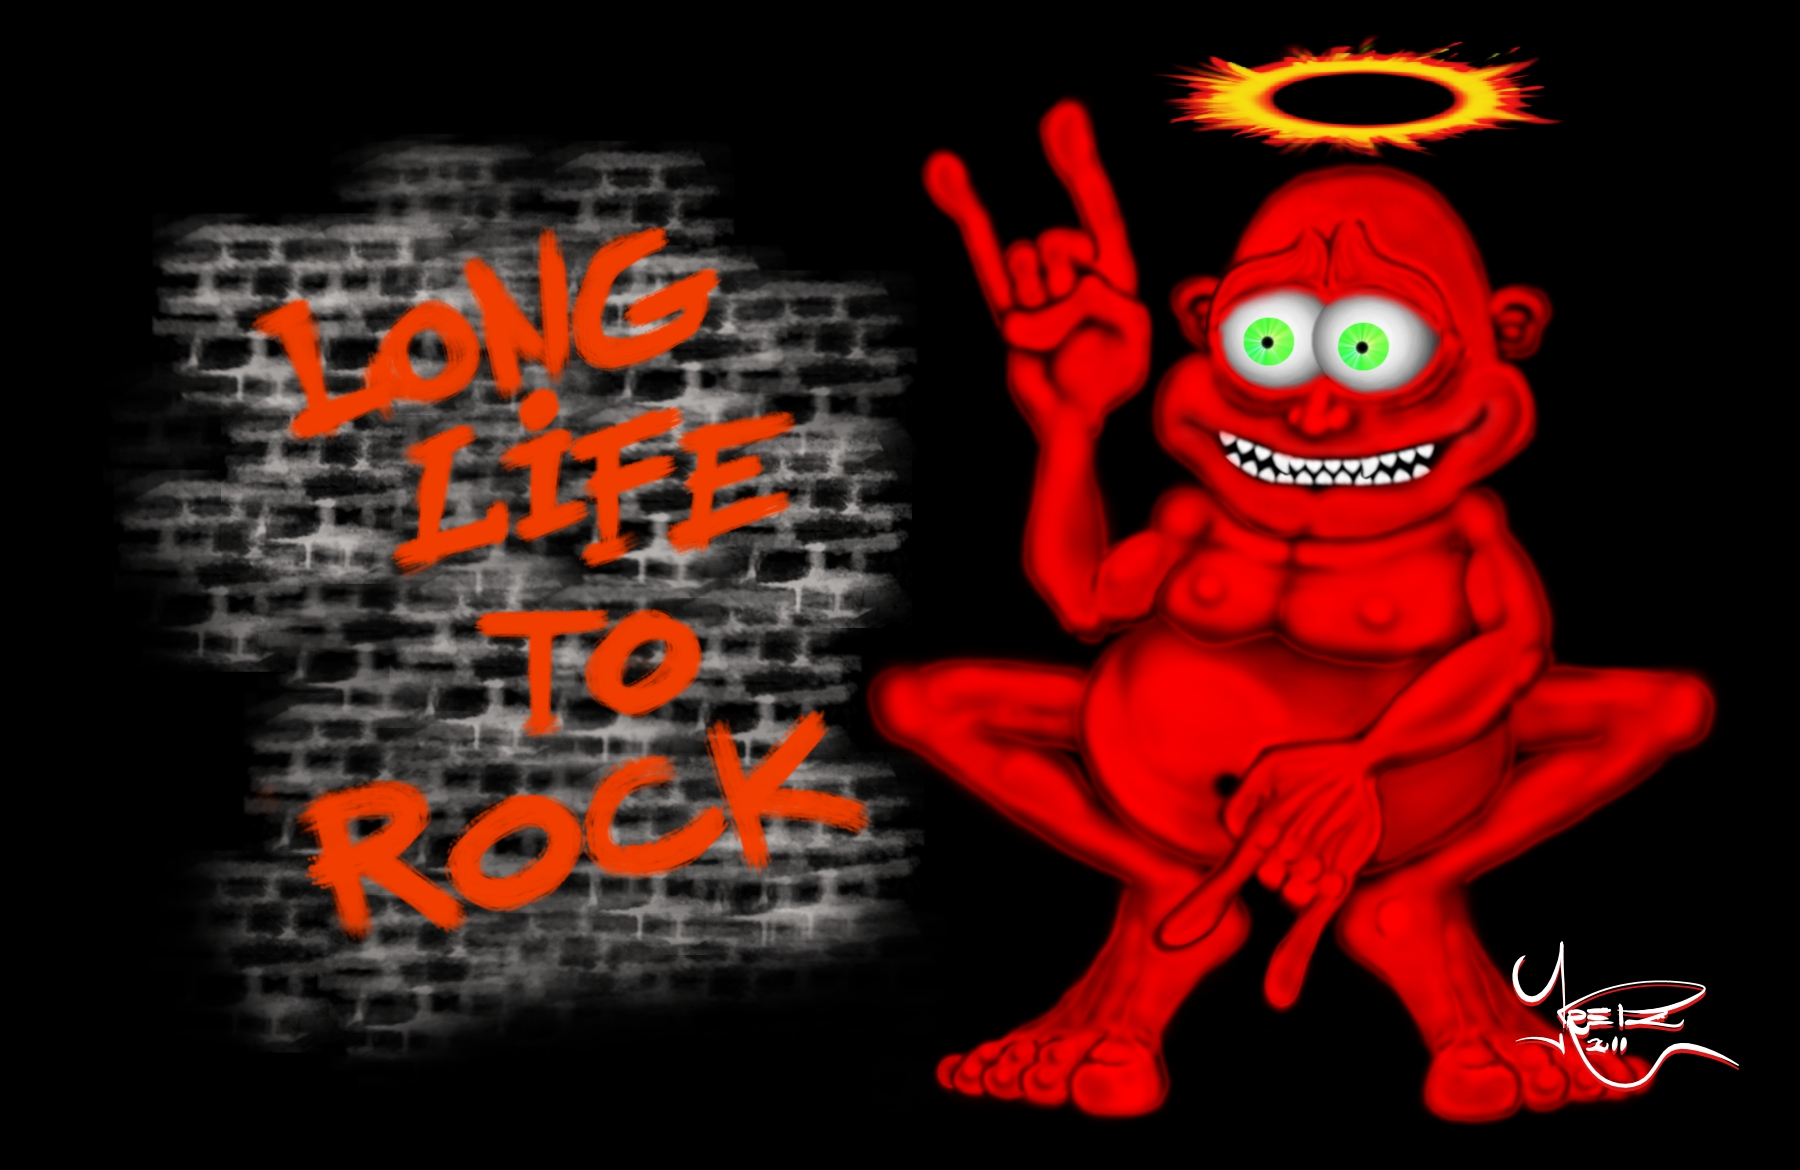 Long life to rock!